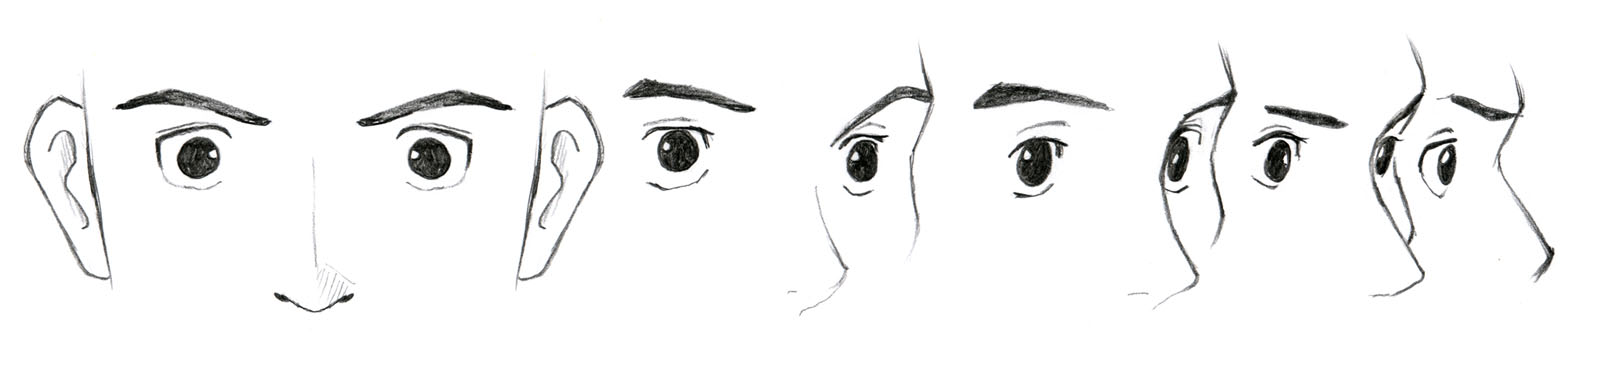 how to draw manga eyes pdf